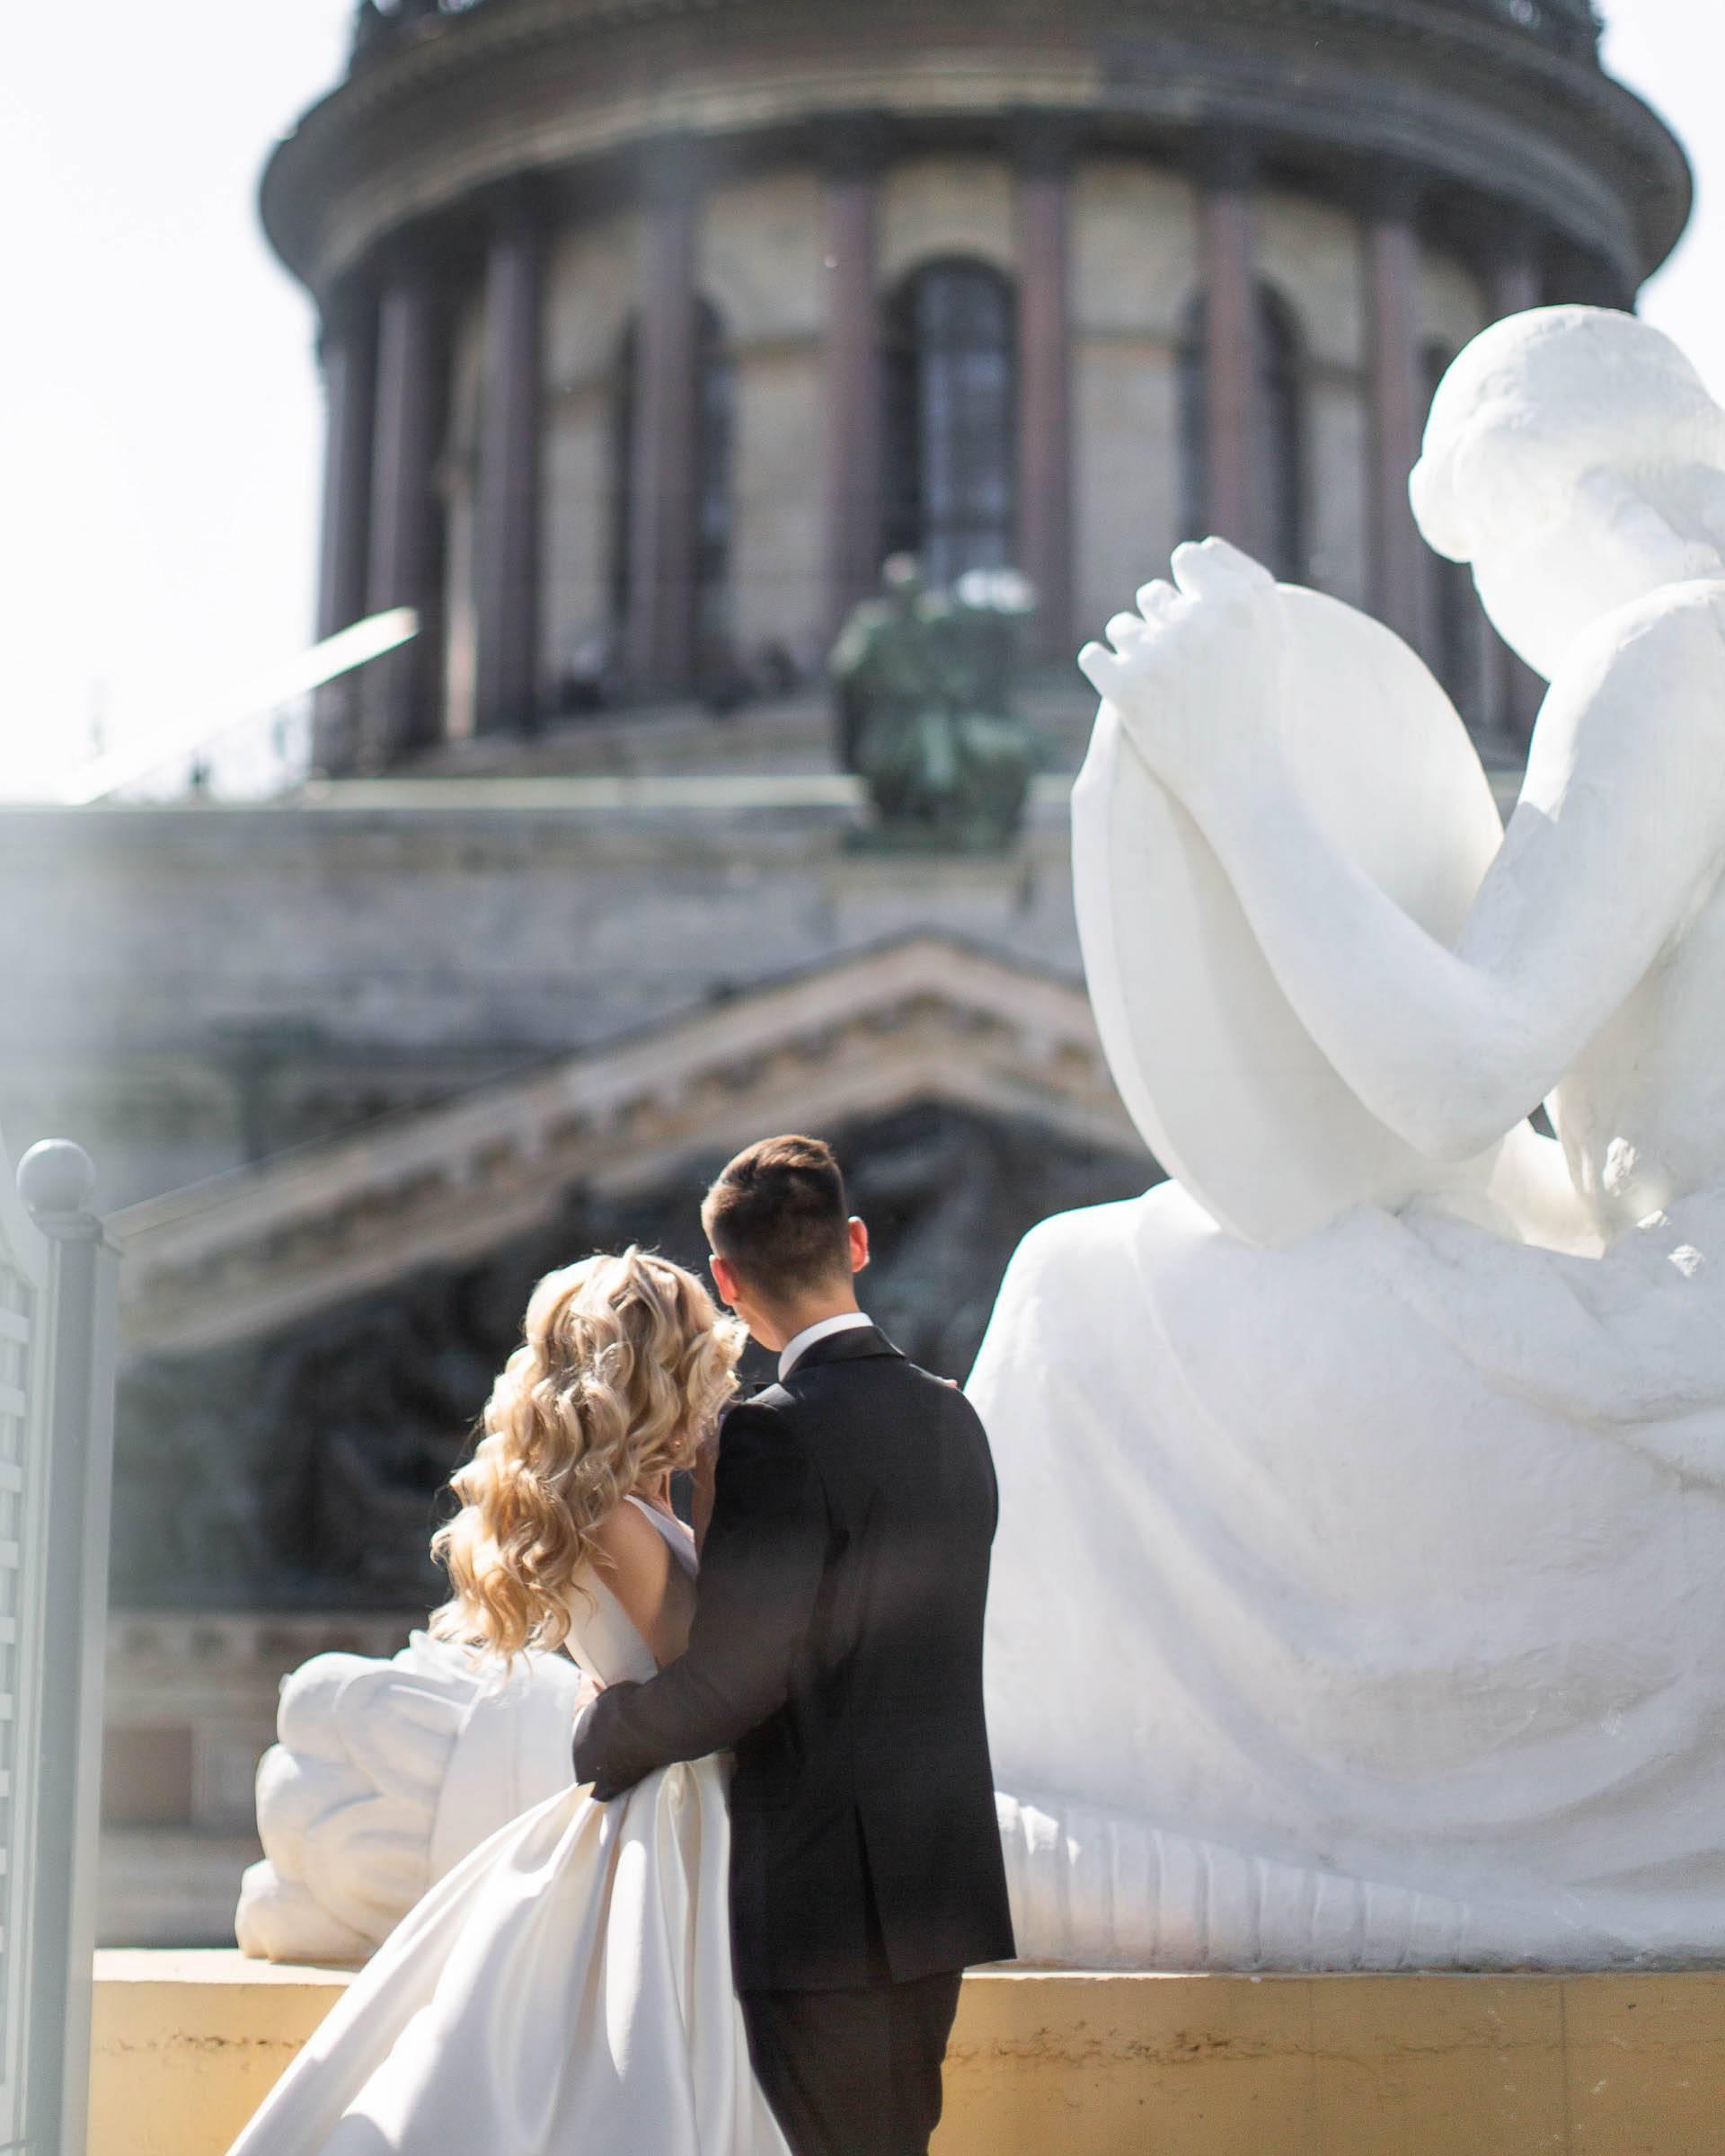 Свадьба в Санкт-Петербурге на земле и на воде